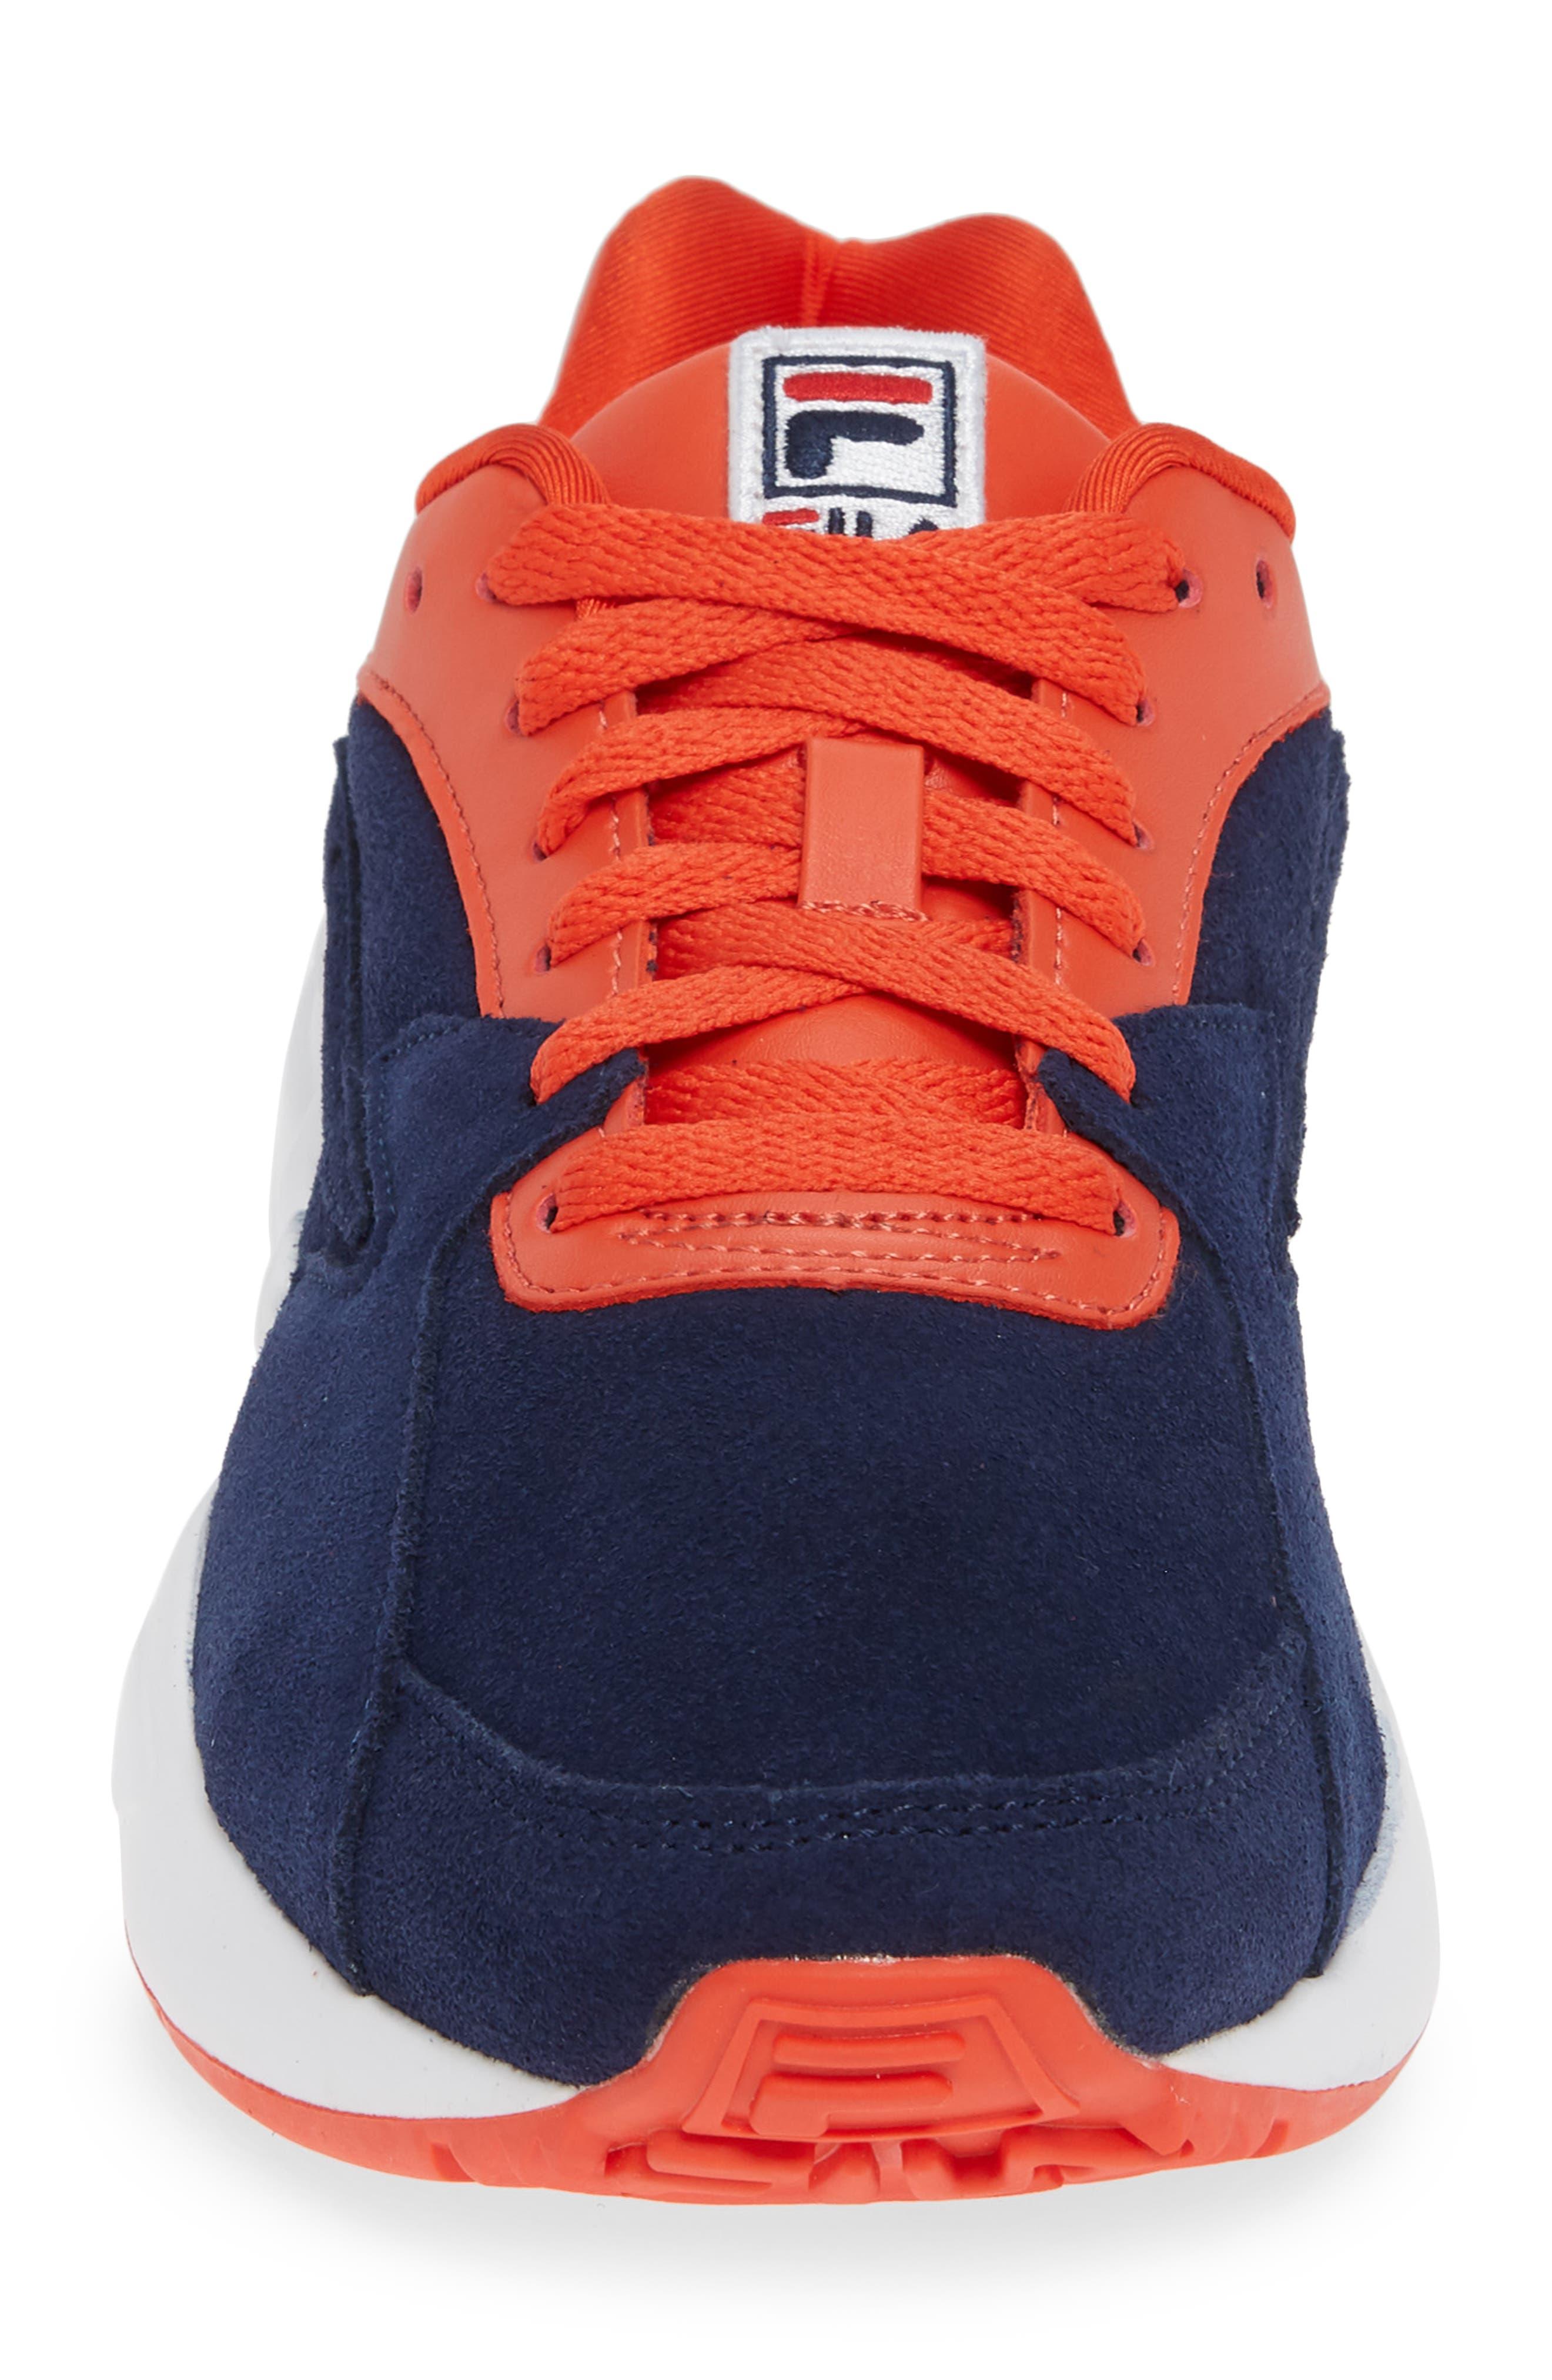 Mindblower Sneaker,                             Alternate thumbnail 4, color,                             NAVY/ WHITE/ RED